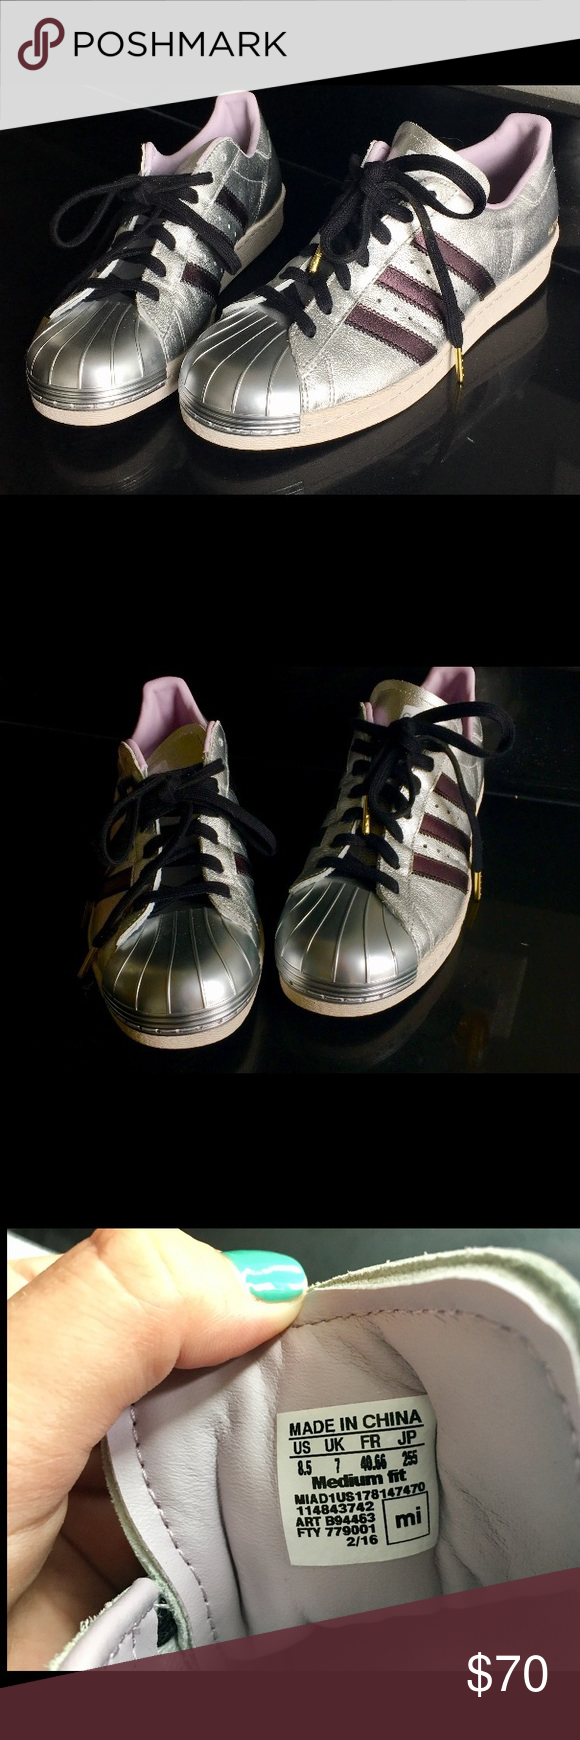 Superstar Adidas Metallic Silver zapatos 8 1 / 2 custom made online